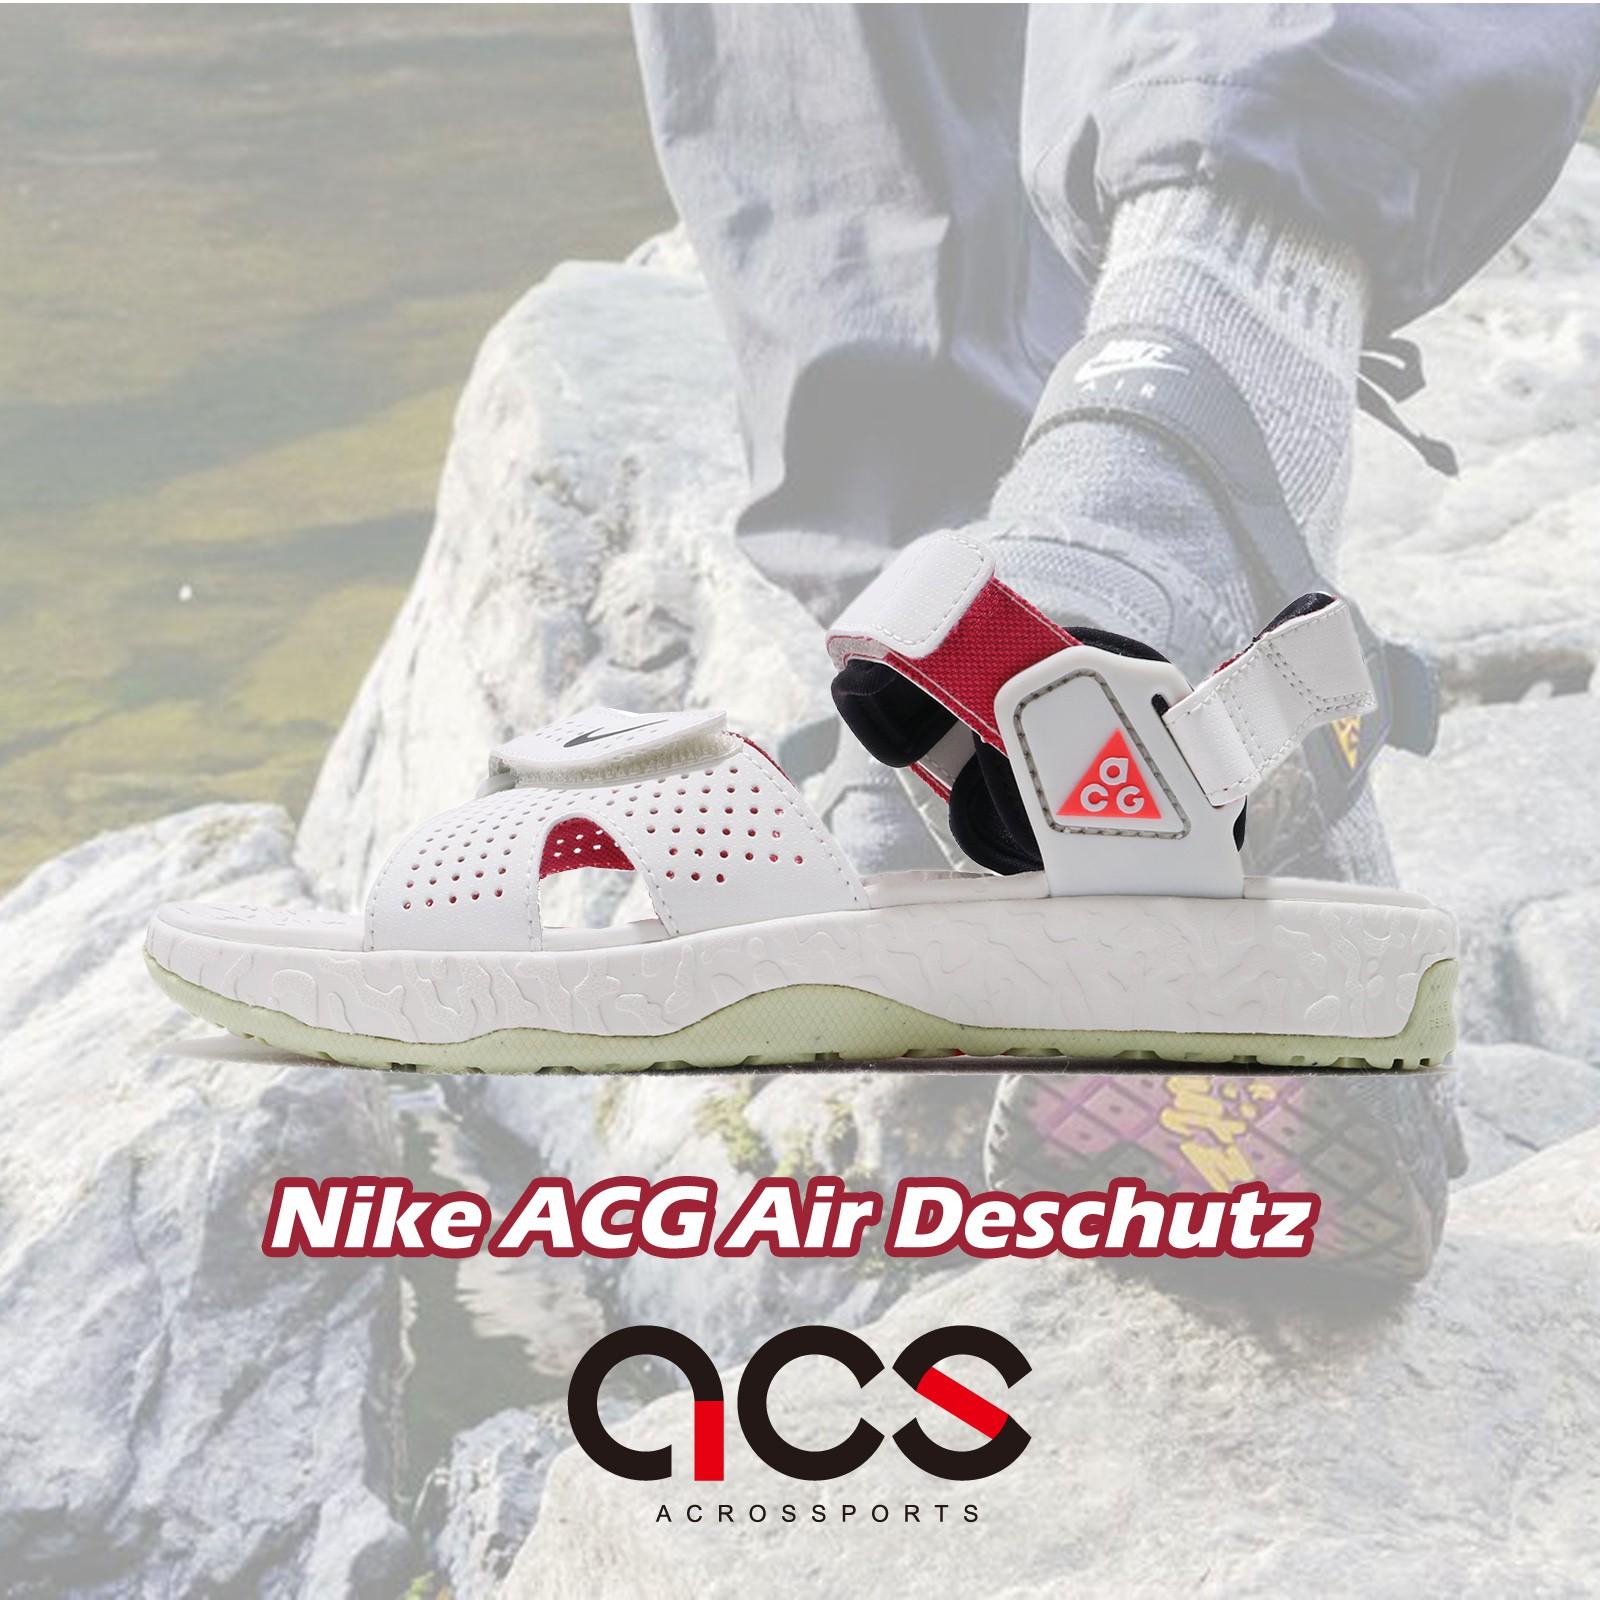 Nike ACG Air Deschutz 涼鞋 白 紫紅 綠底 男鞋 女鞋 戶外風格 【ACS】 CT2890-001